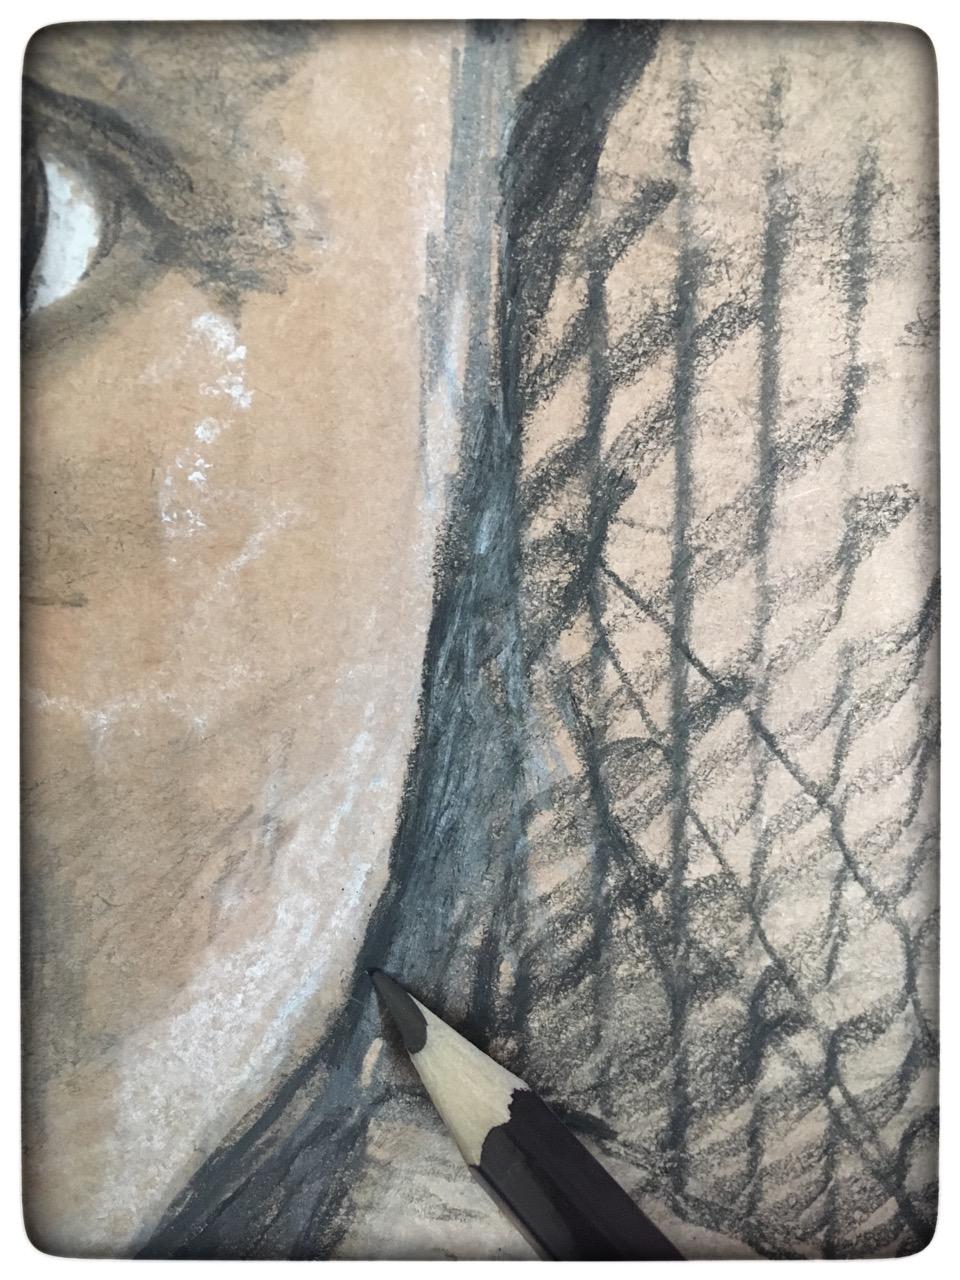 Close up of portrait in progress